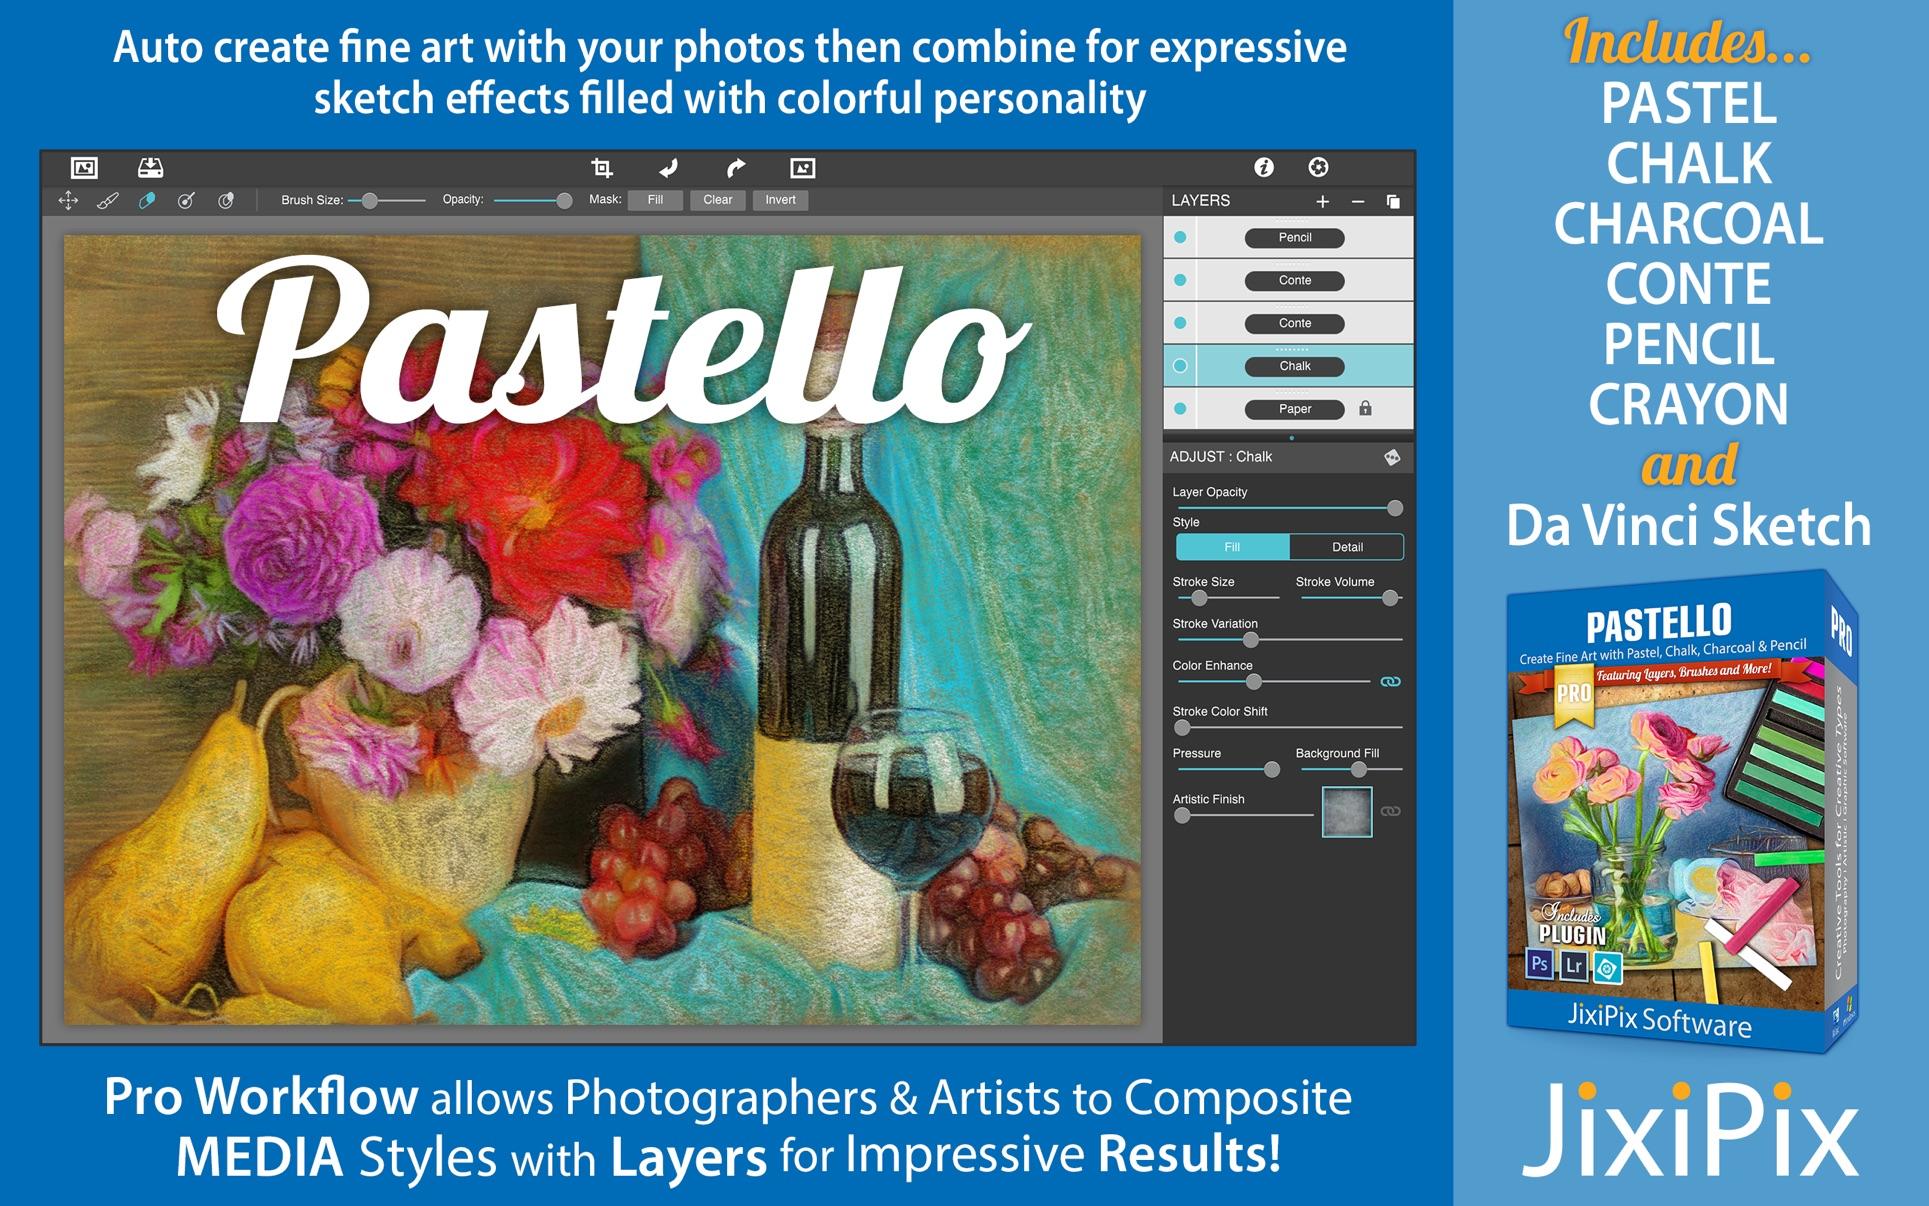 JixiPix Pastello Pro 1.1.16 Mac 破解版 图像编辑器